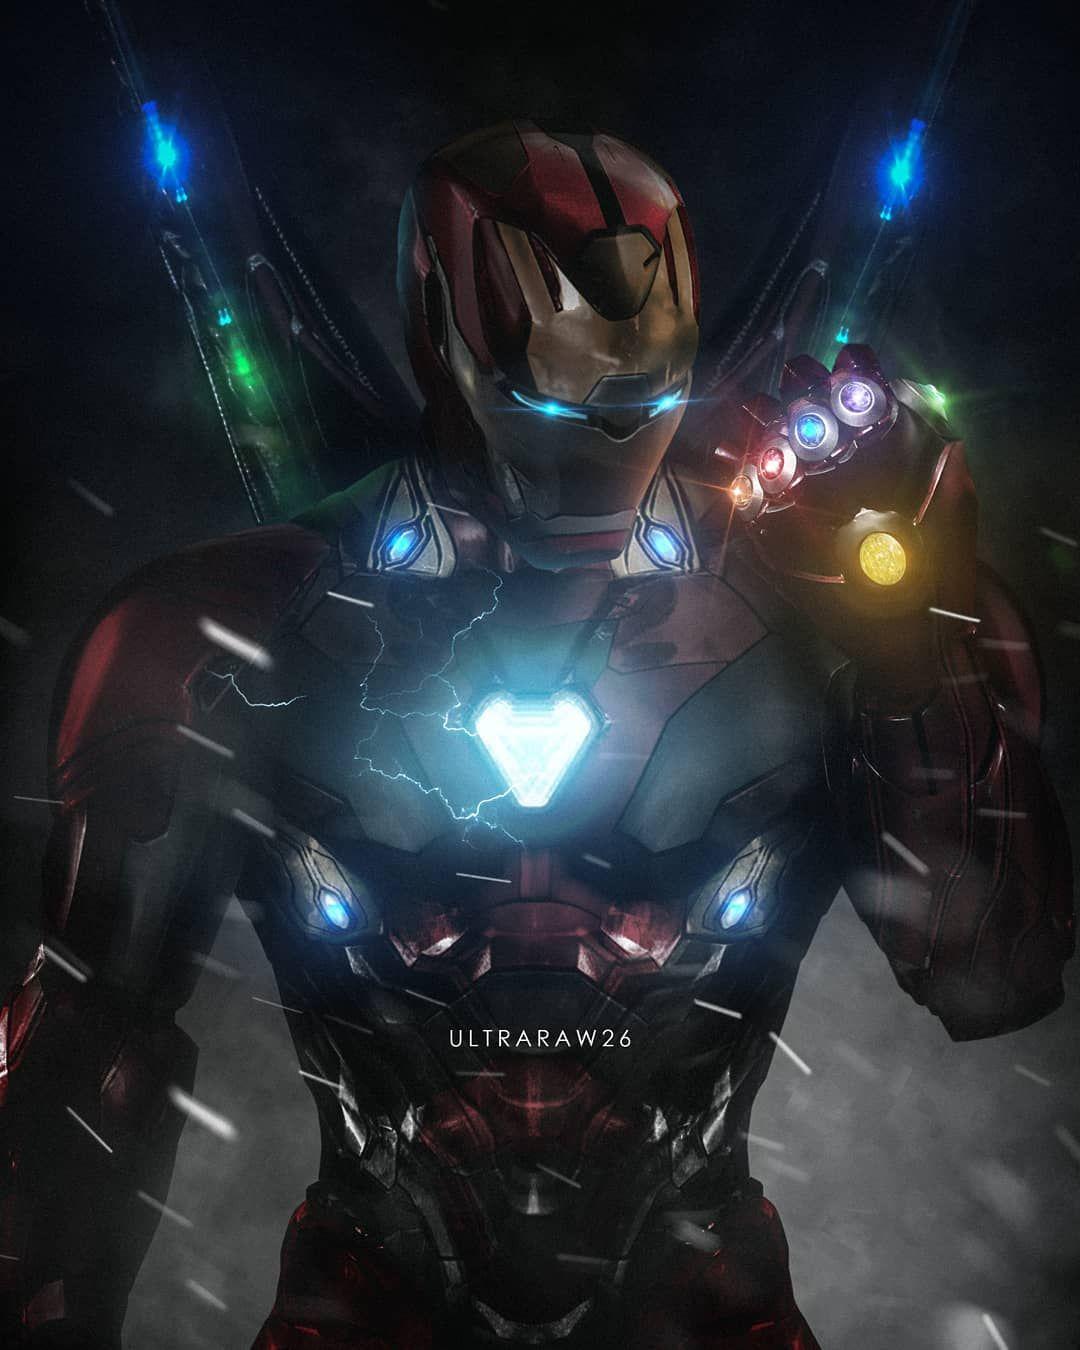 Hopefully One Day Robertdowneyjr Follow Ultraraw26 For More Ironman Infinitywar Thanos Avengers Infinityw Marvel Avengers Marvel Iron Man Avengers